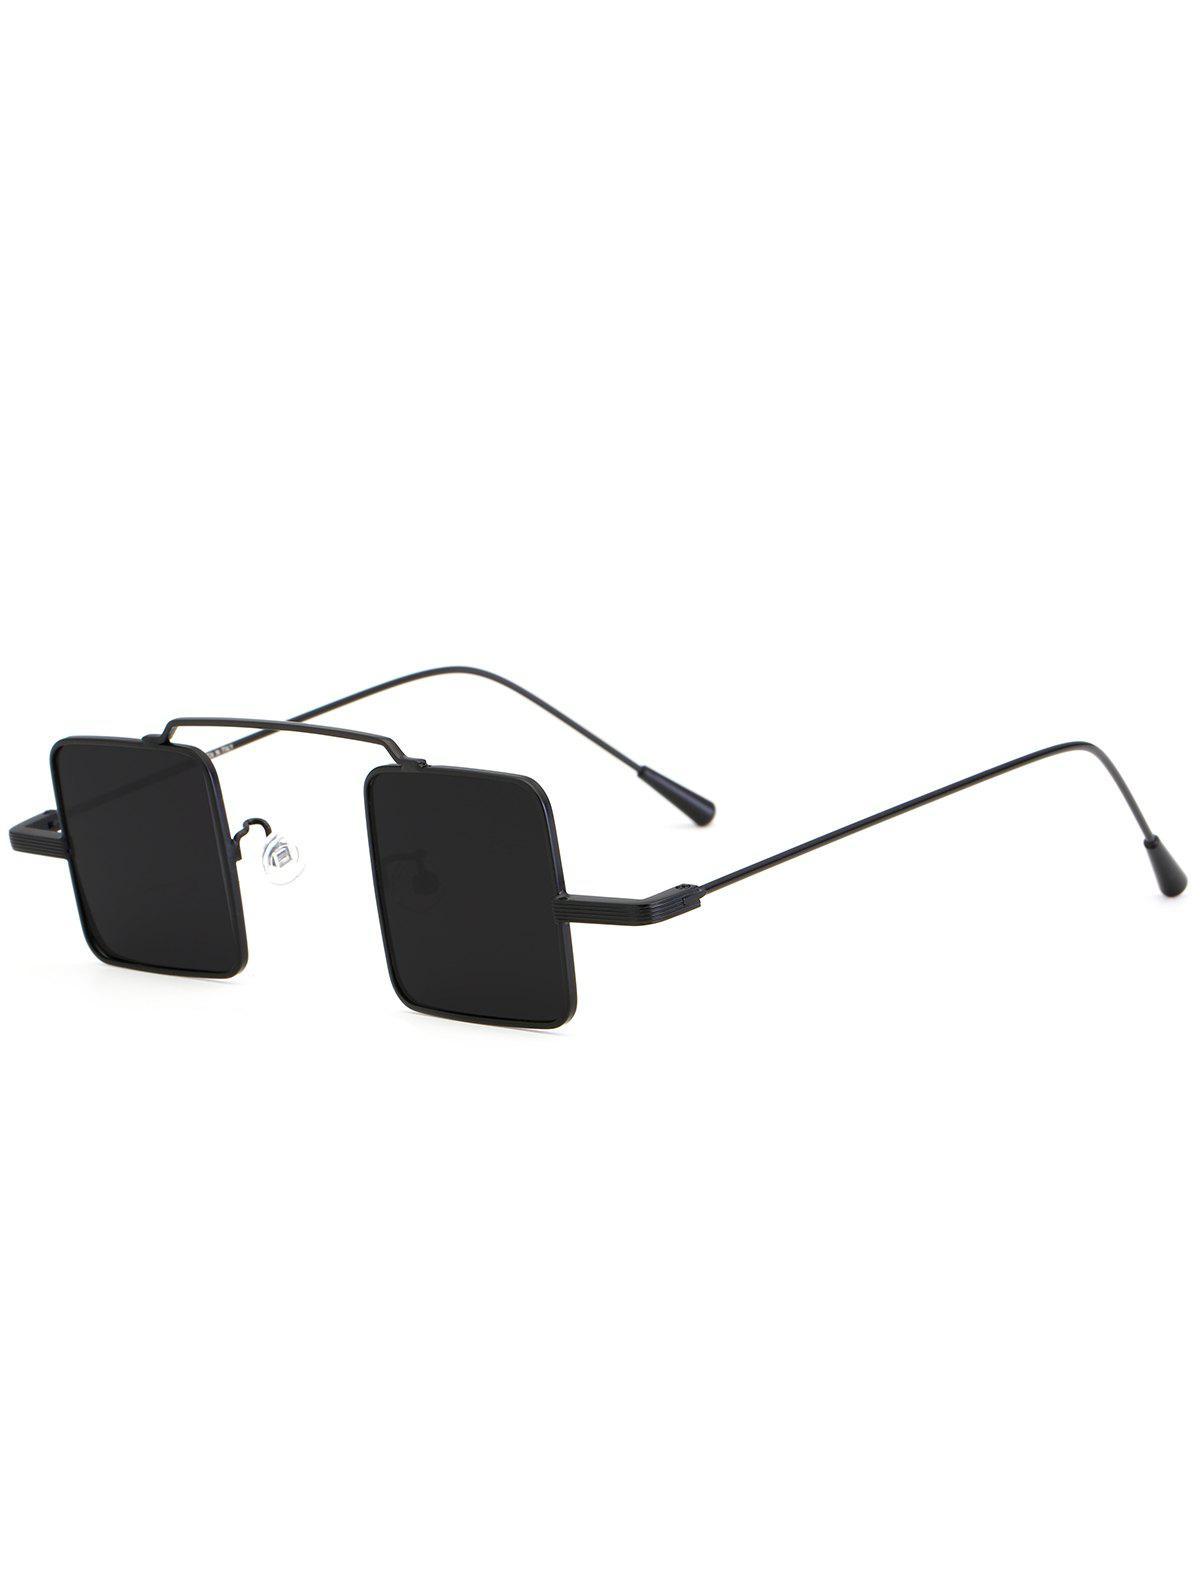 Vintage Square Shape Full Frame Sunglasses 231951401